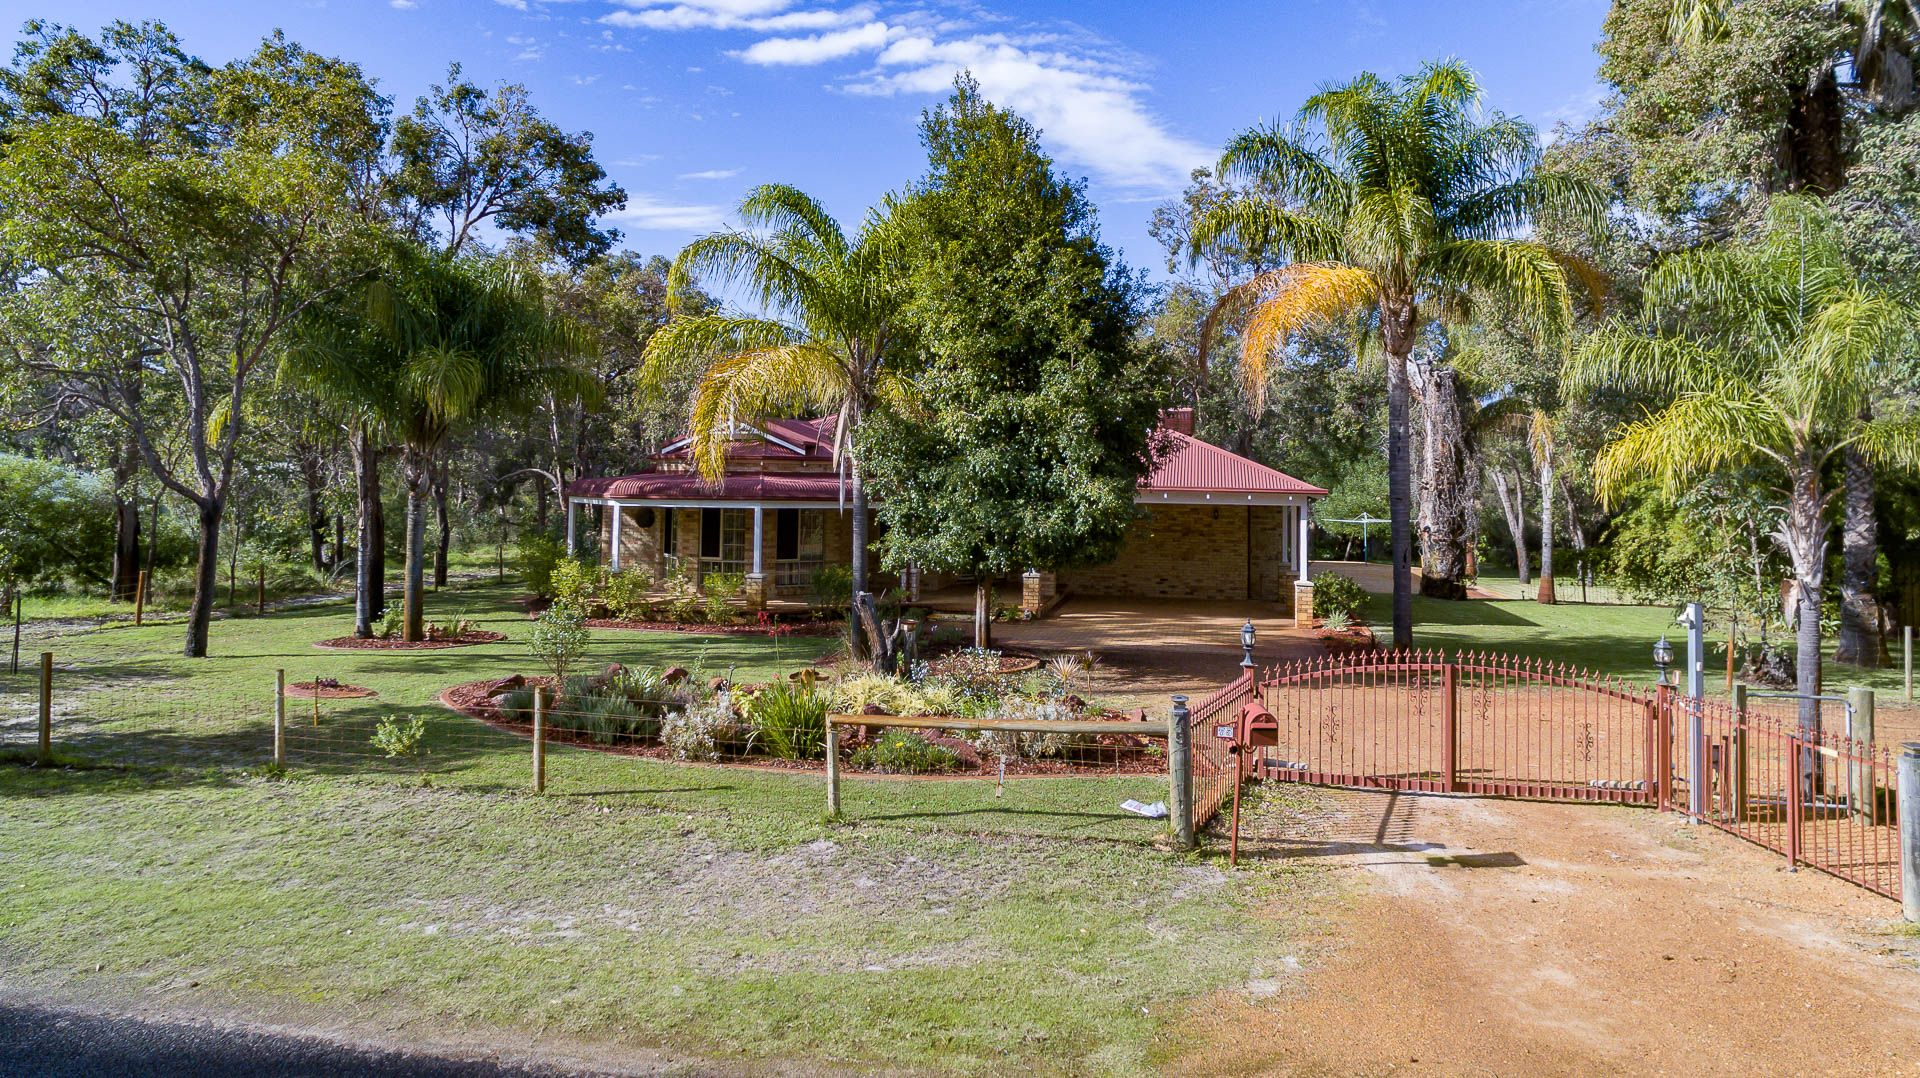 75 Australind Road, Leschenault